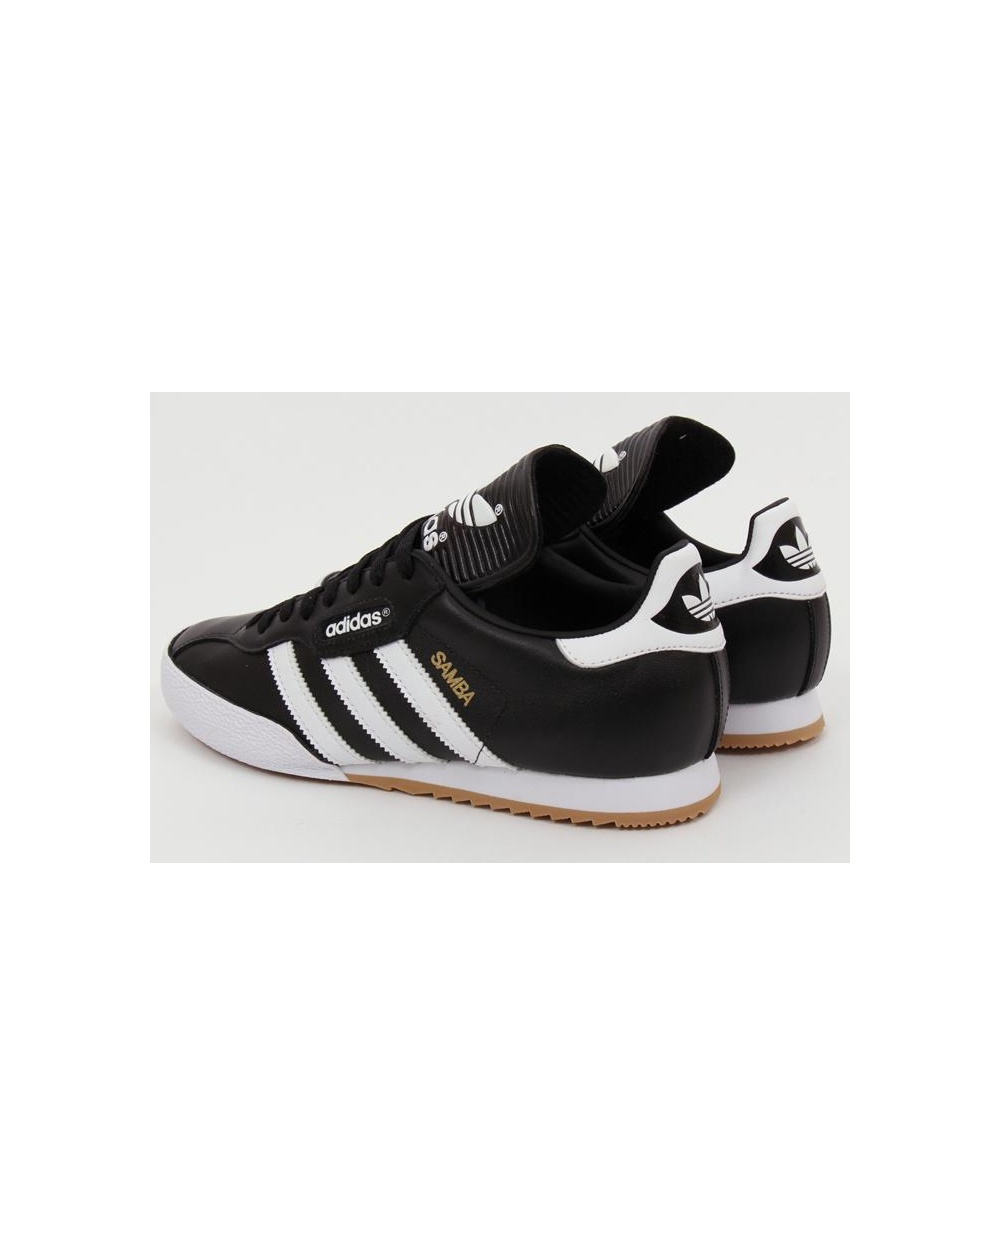 da8c45d77337 italy adidas samba super trainers black white ed128 a41ce